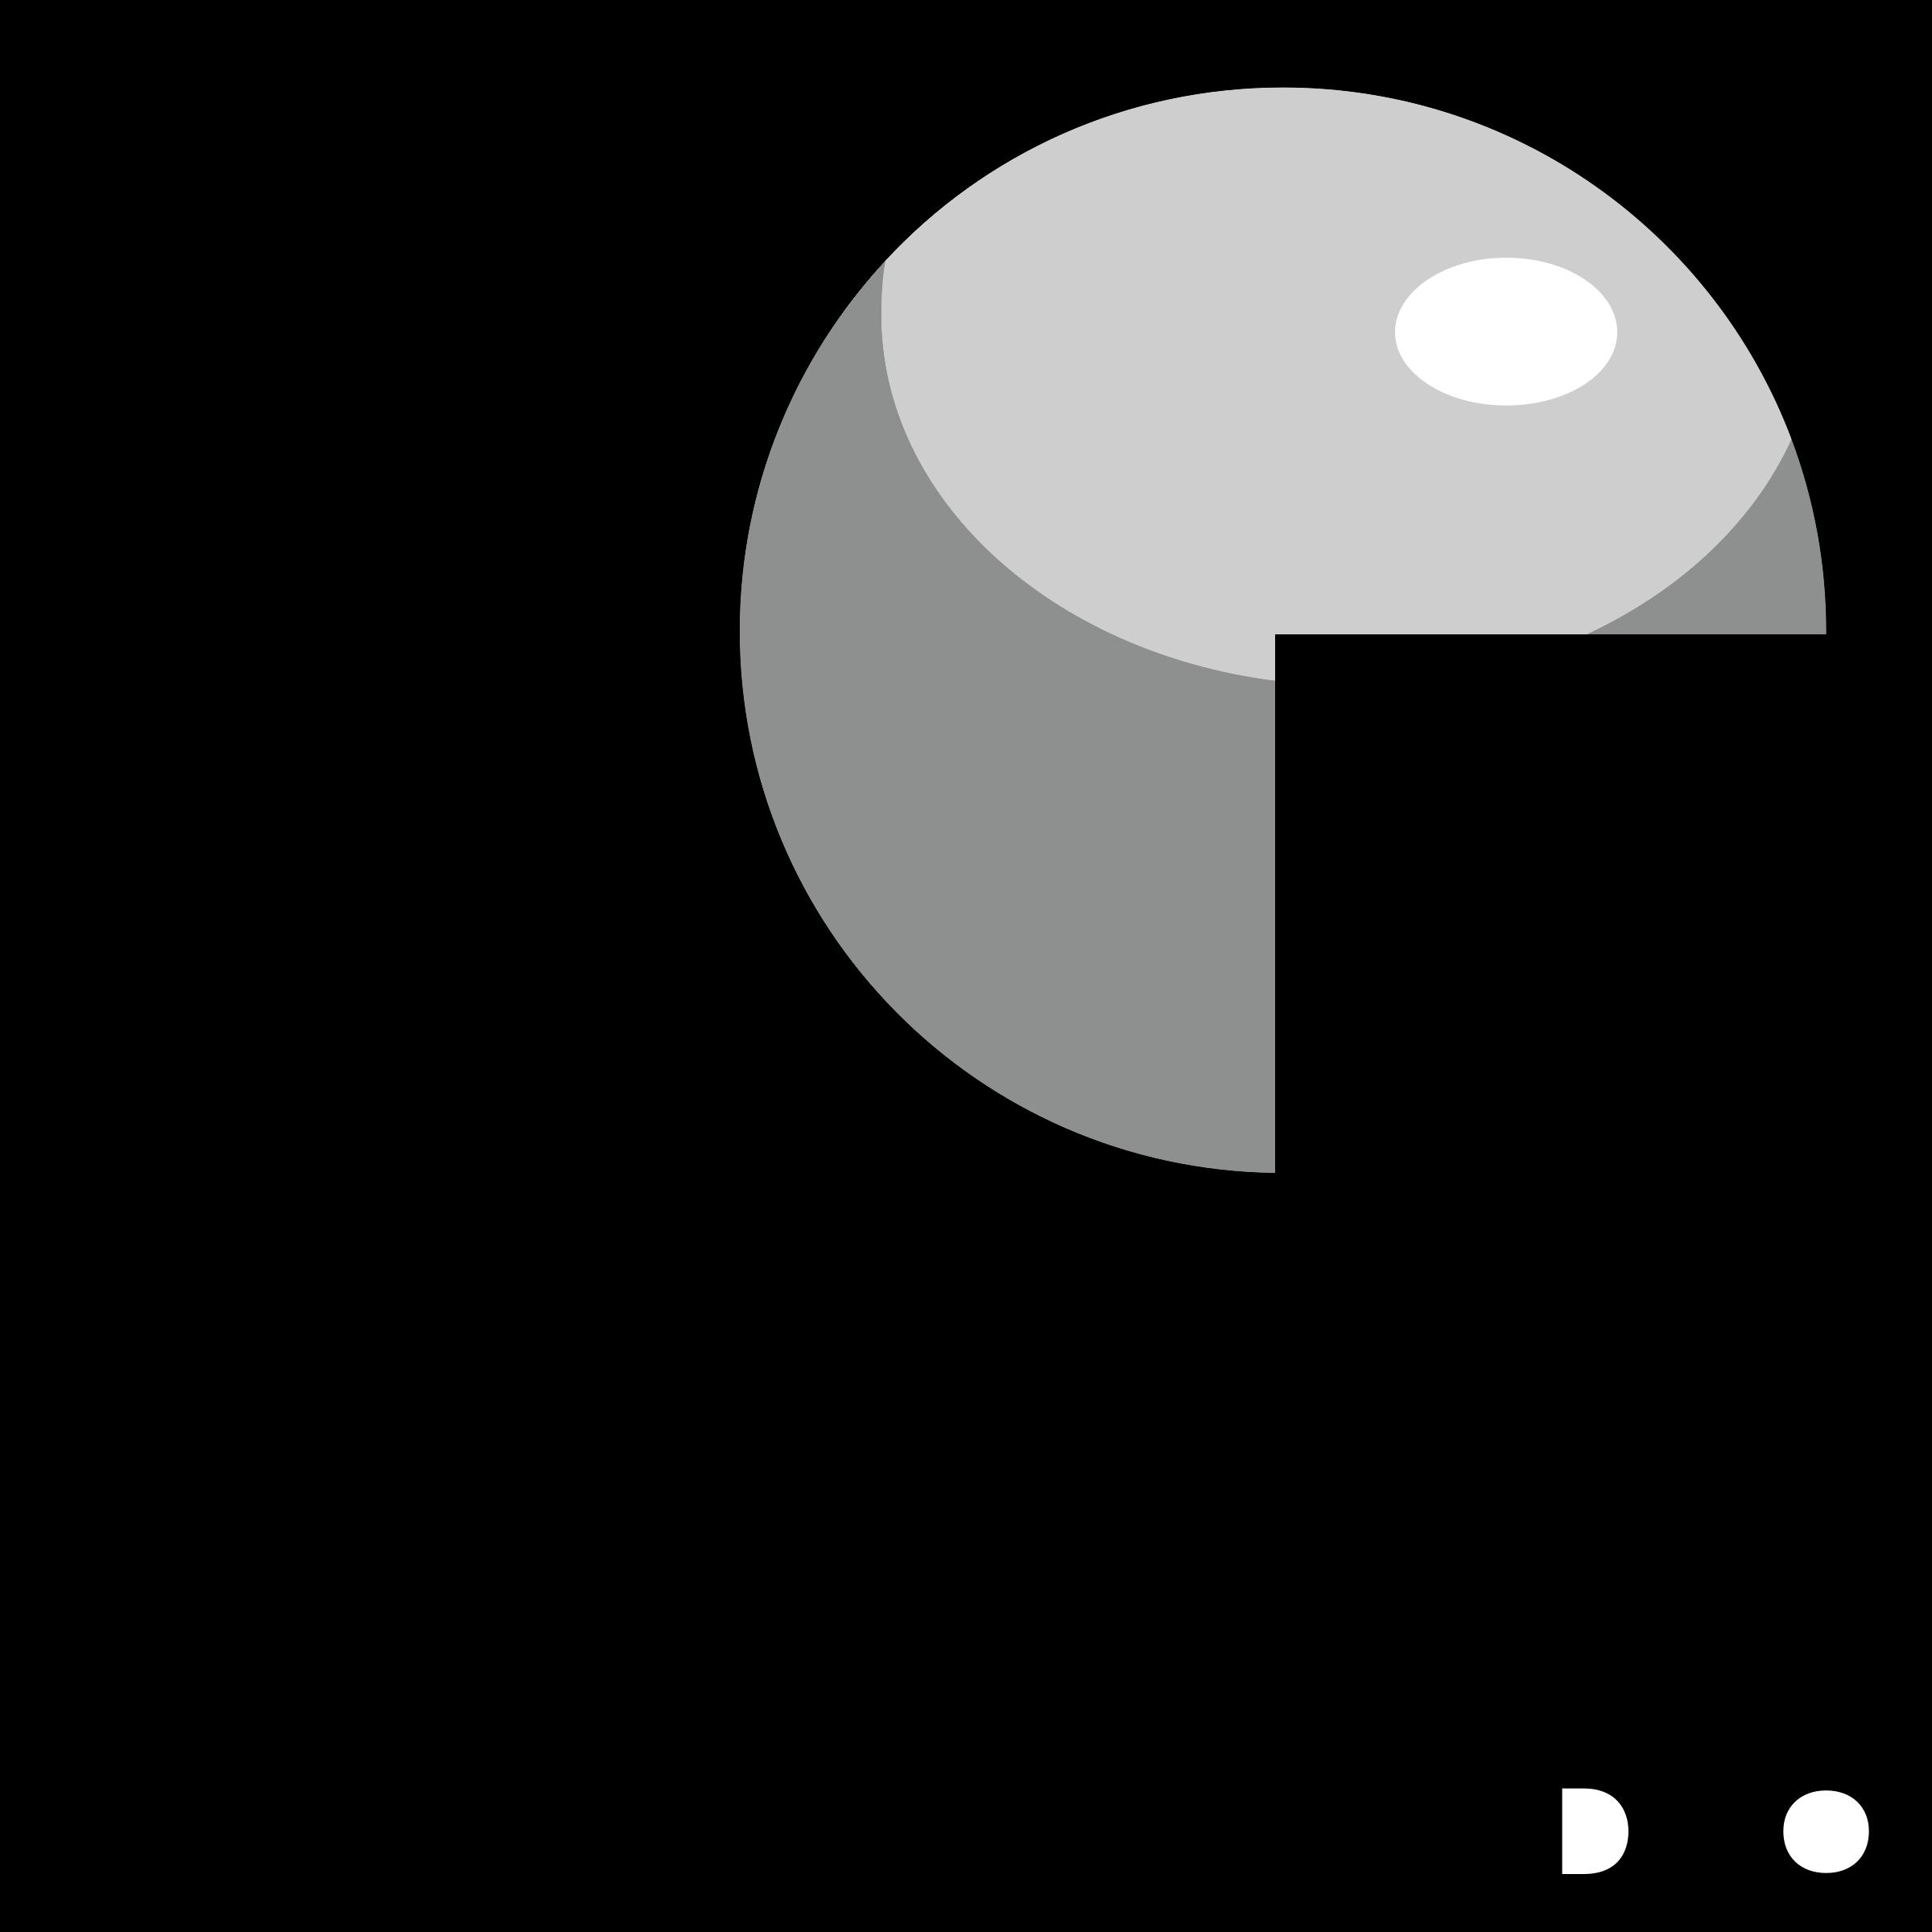 Telemundo Logo PNG Transparent & SVG Vector.